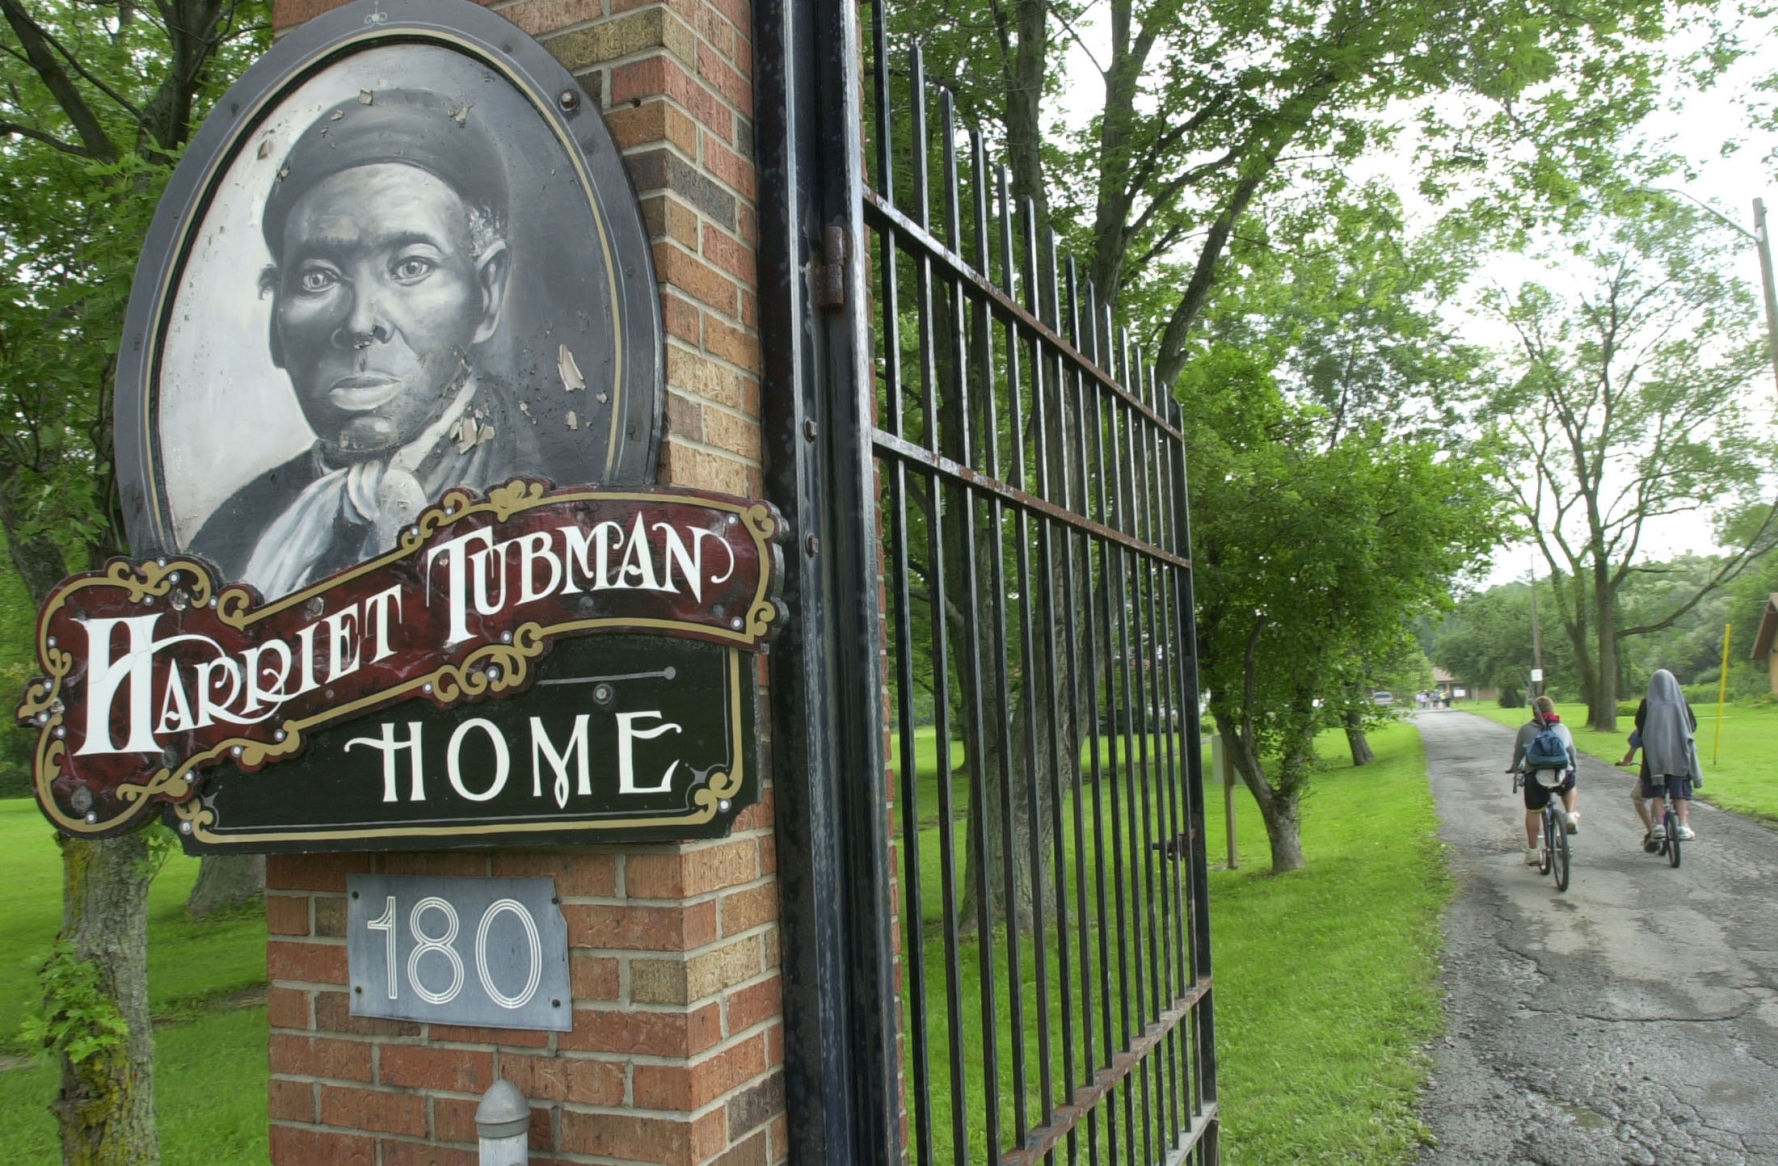 Tubman park celebrated u0027Moses of her peopleu0027